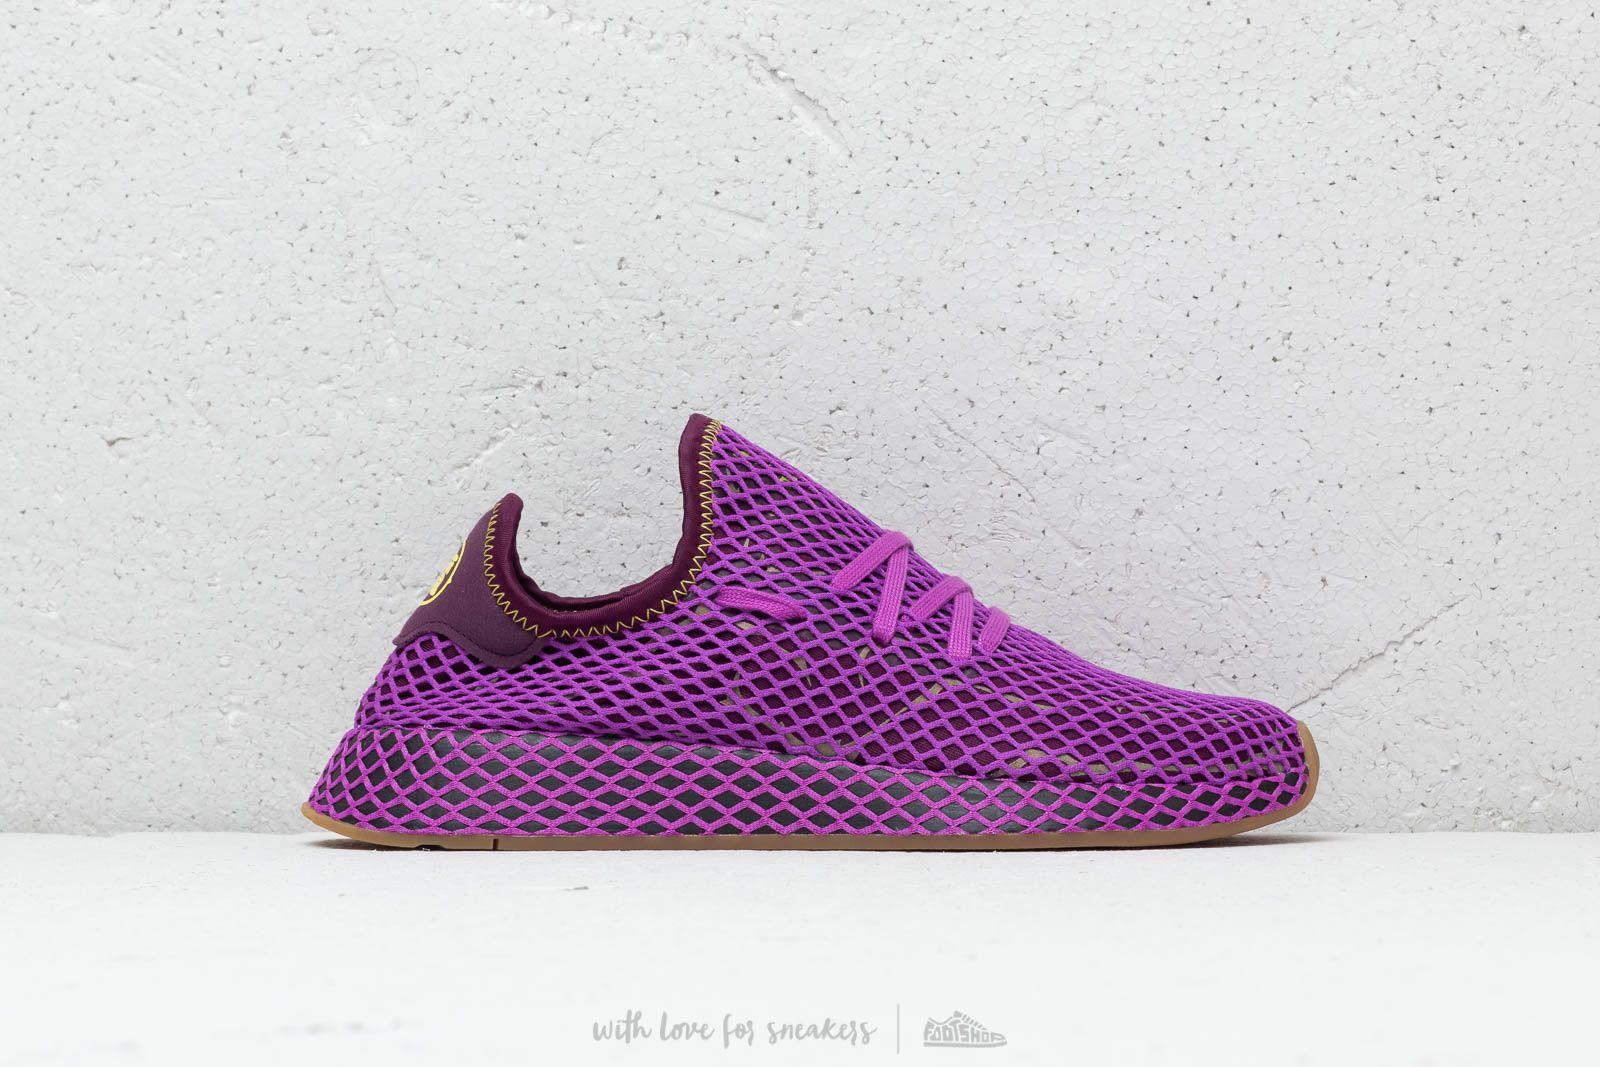 adidas x Dragon Ball Z Deerupt Runner Shock Purple Red Night Shock Yellow | Footshop